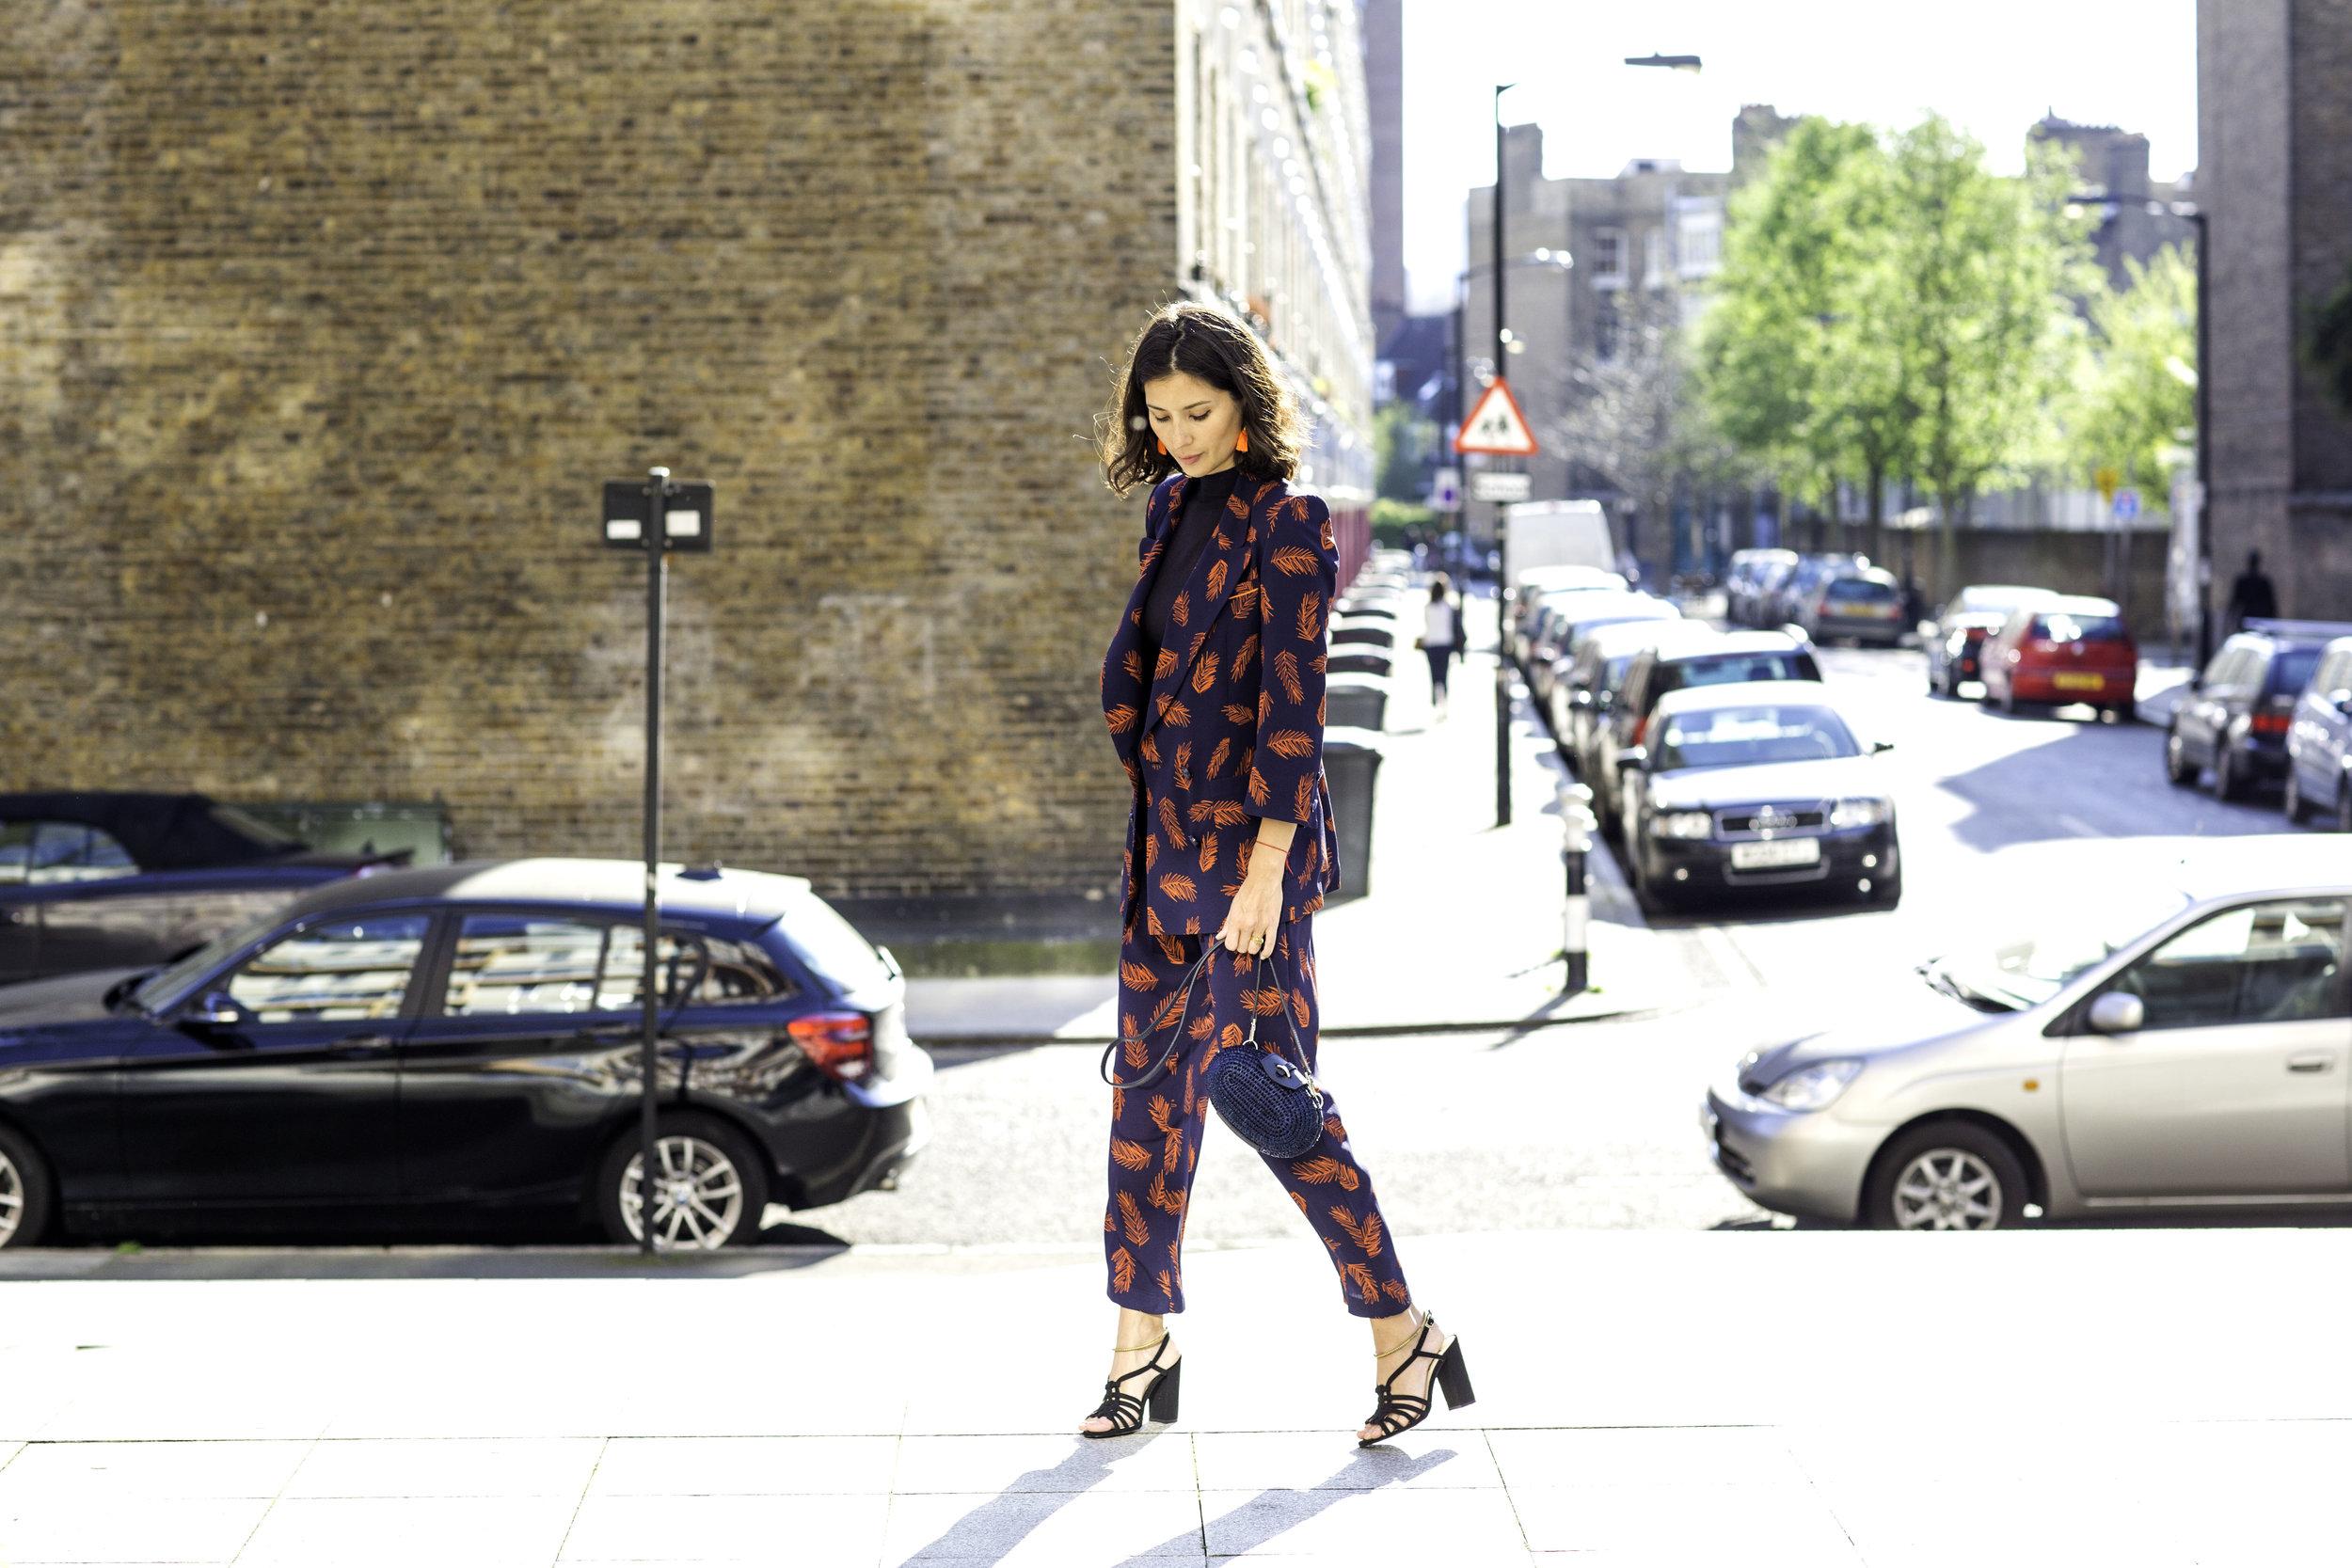 JasmineHemsley_FashionRevolution_Suit.jpg